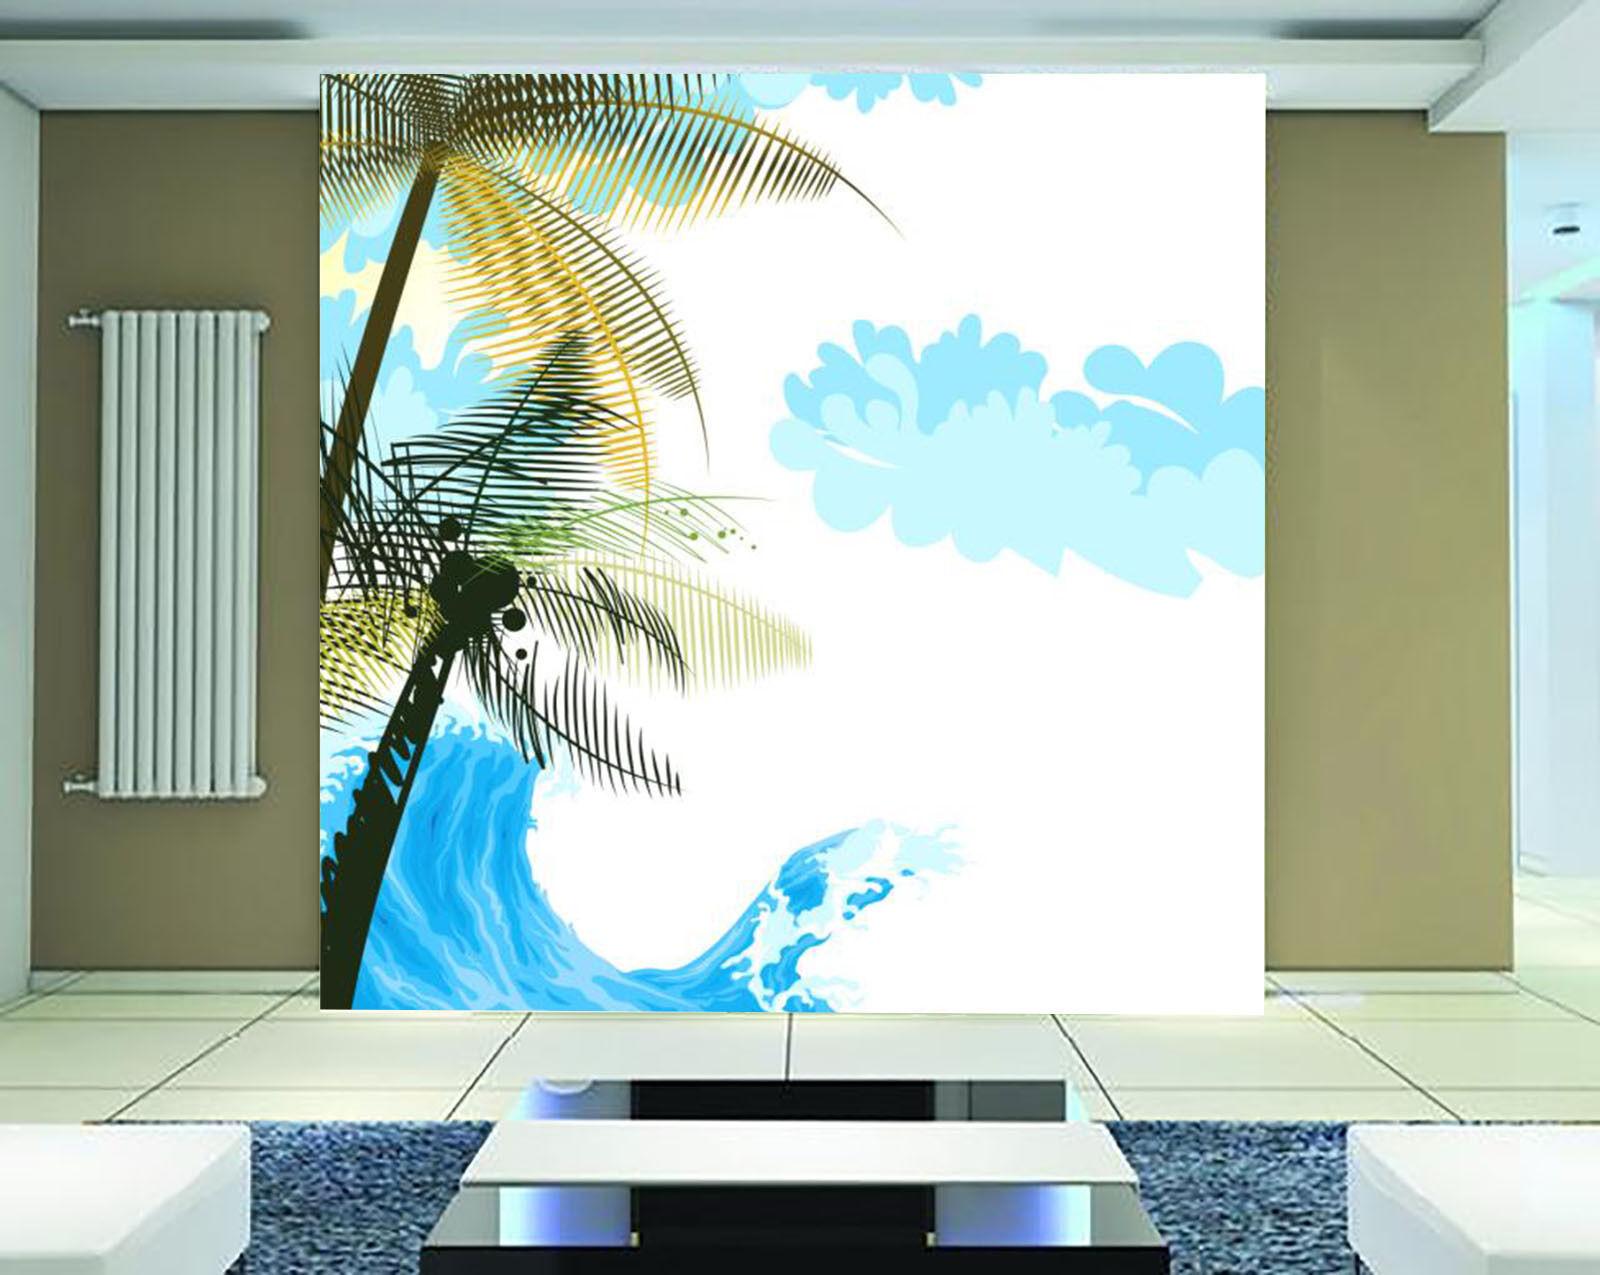 3D Wellen, Bäume 78 Fototapeten Wandbild Fototapete BildTapete Familie